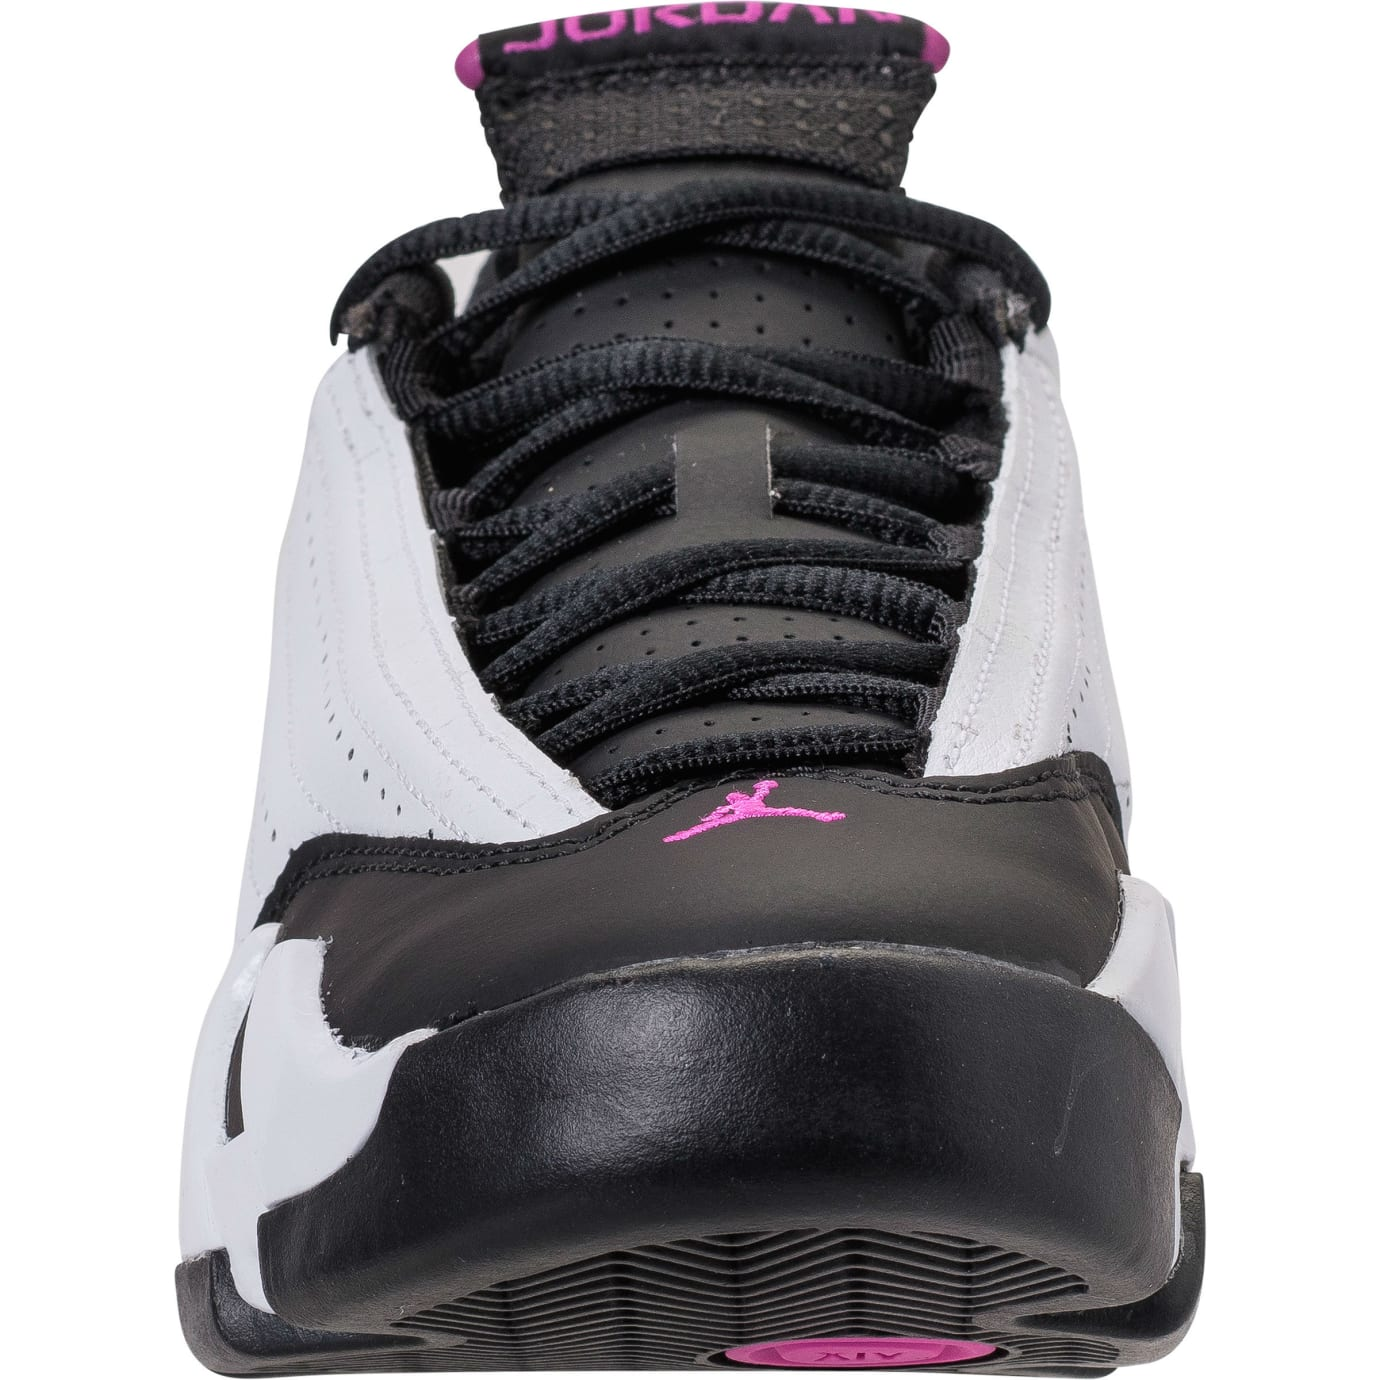 aafb17ff1d5bf9 Air Jordan 14 XIV Girls Fuchsia Blast Release Date 654969-110 Front